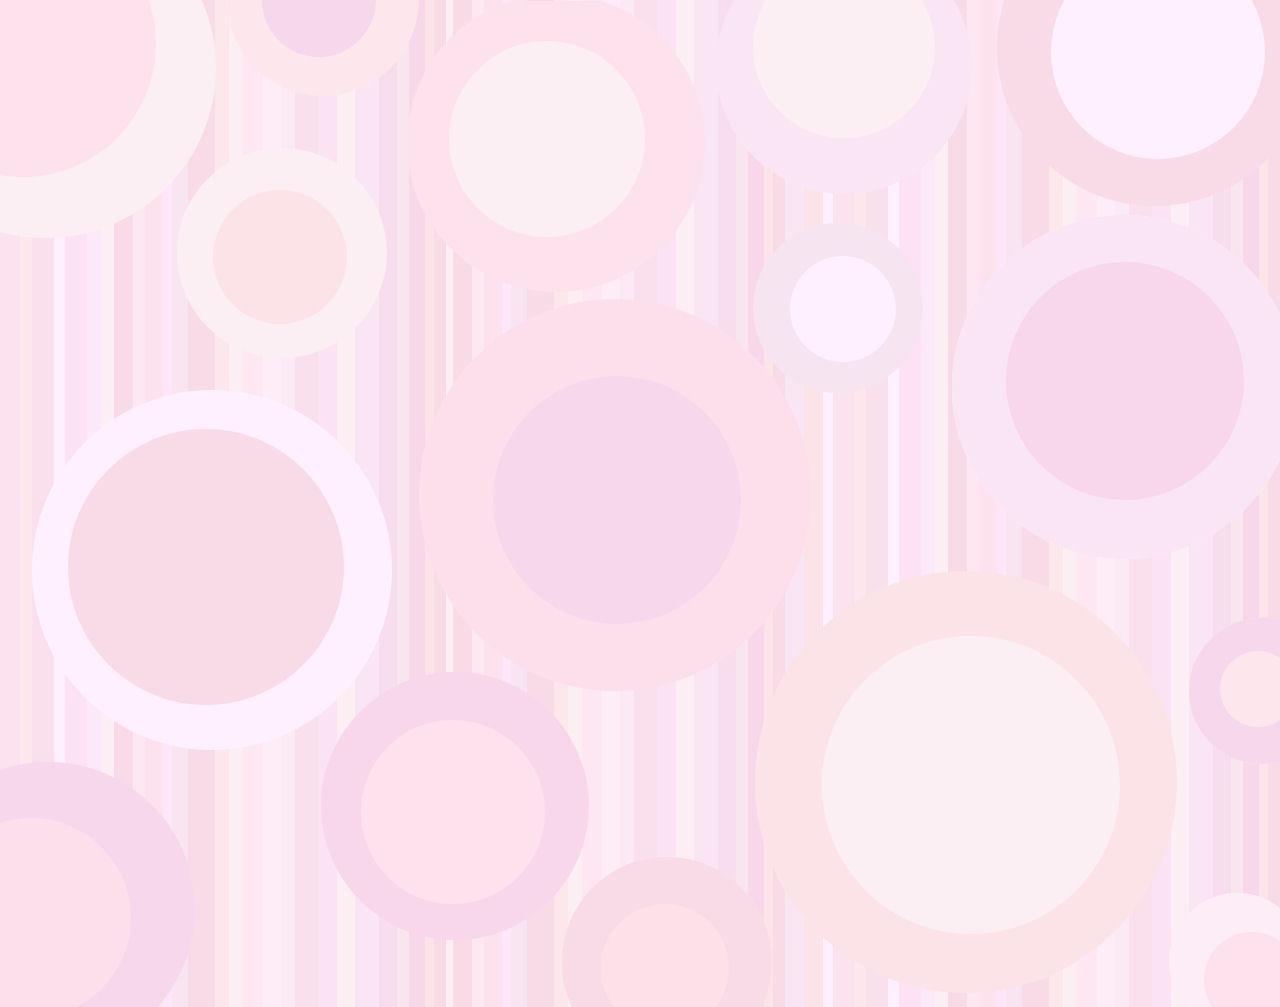 Home rose petal pink baby set funky light pink dots 1280x1007